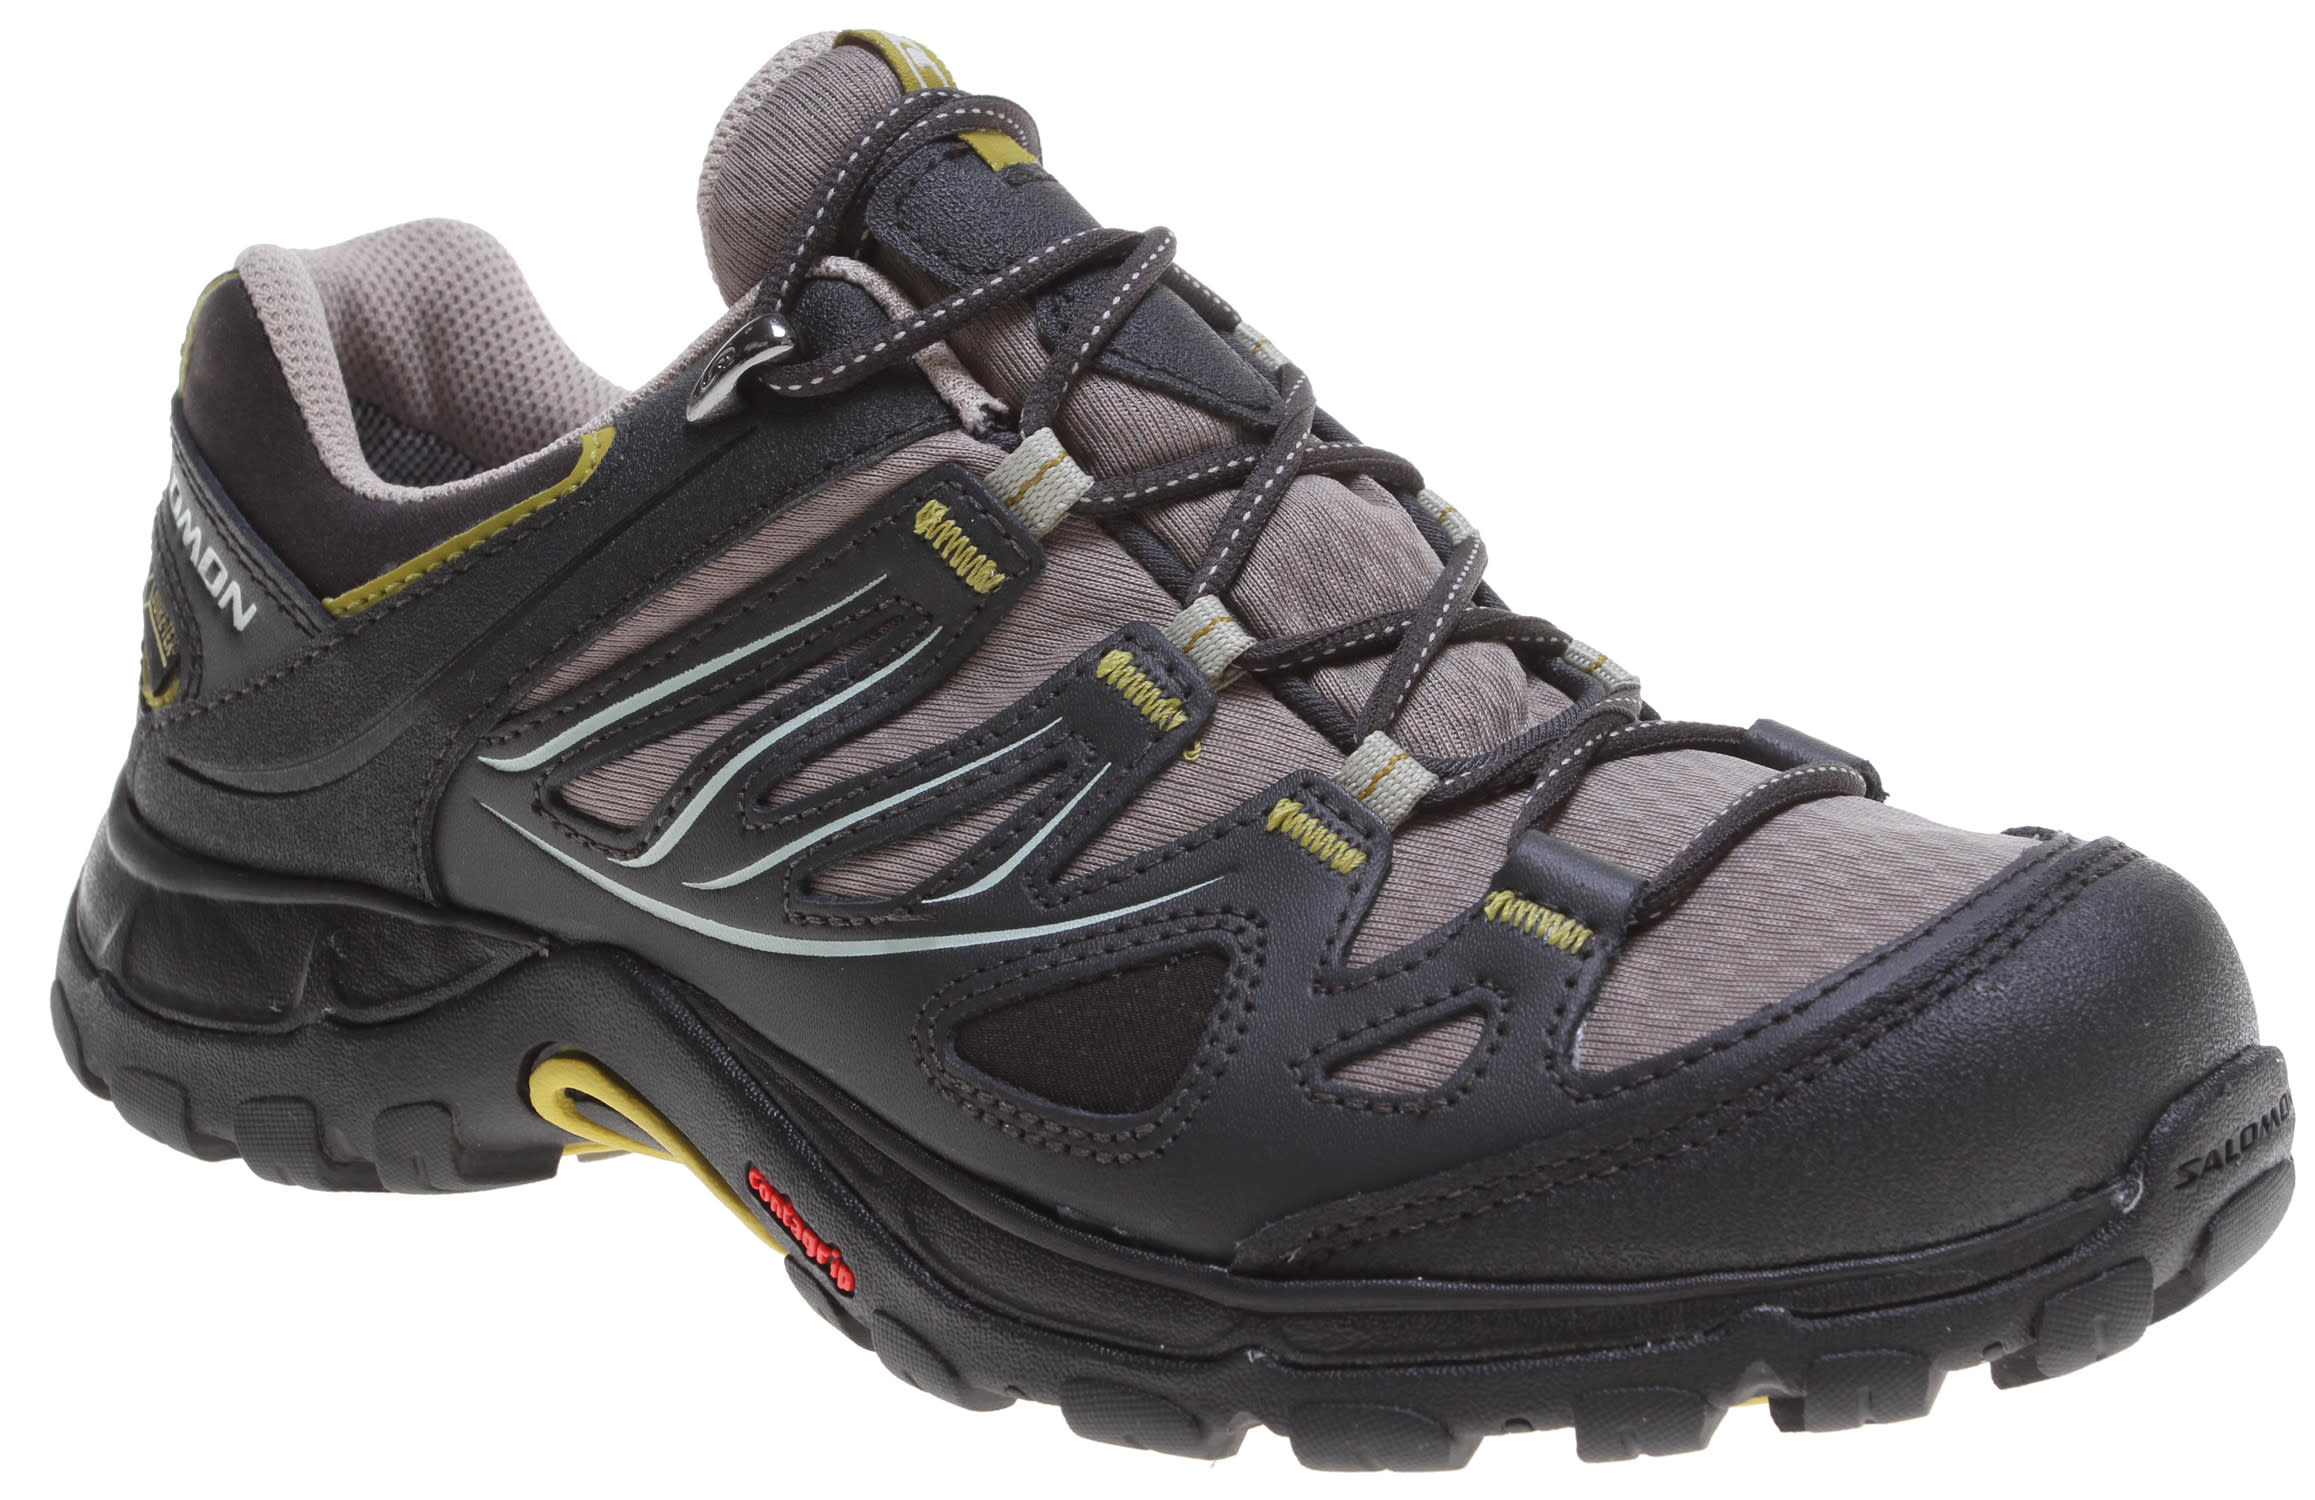 Womens Ellipse Gtx Hiking Shoe